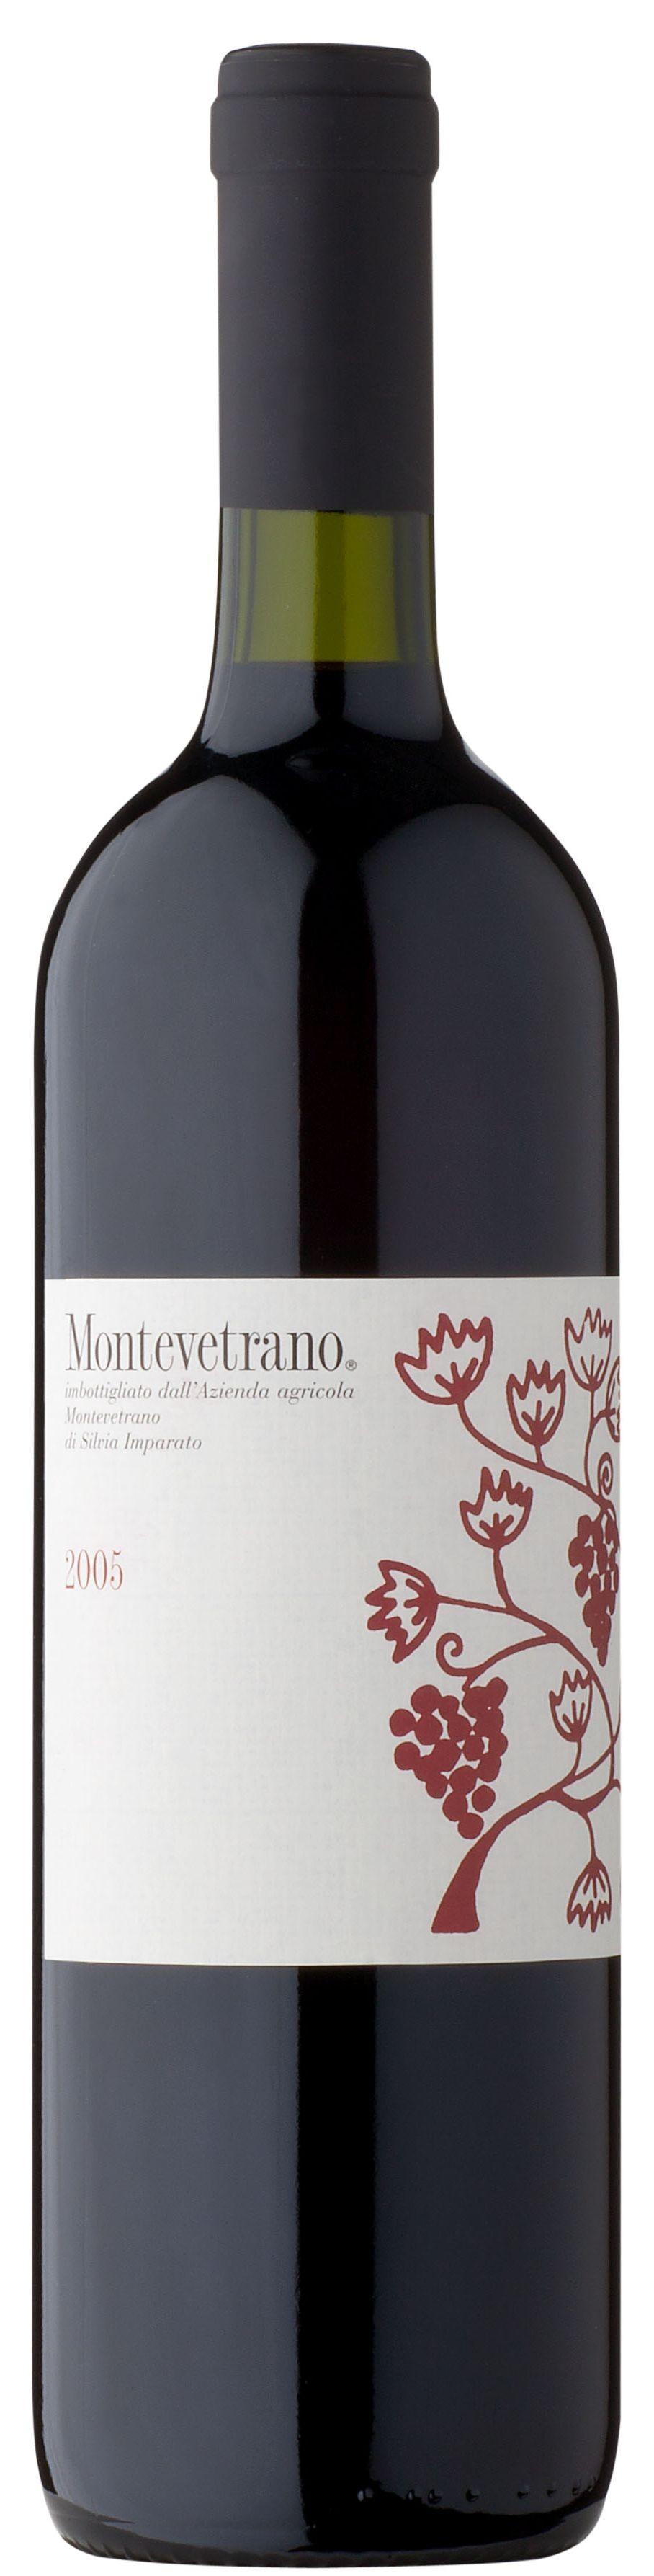 Montevetrano - Montevetrano IGT, 2009